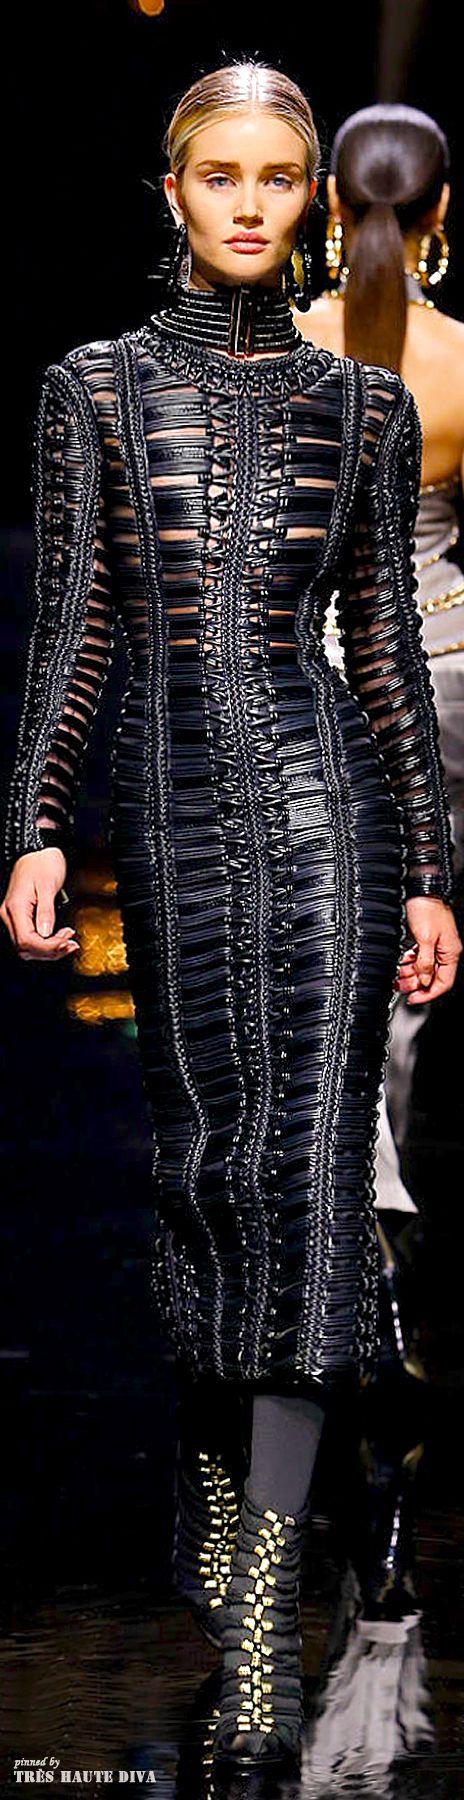 Balmain F/W 2014 - Paris Fashion Week - This leather dress and the cut